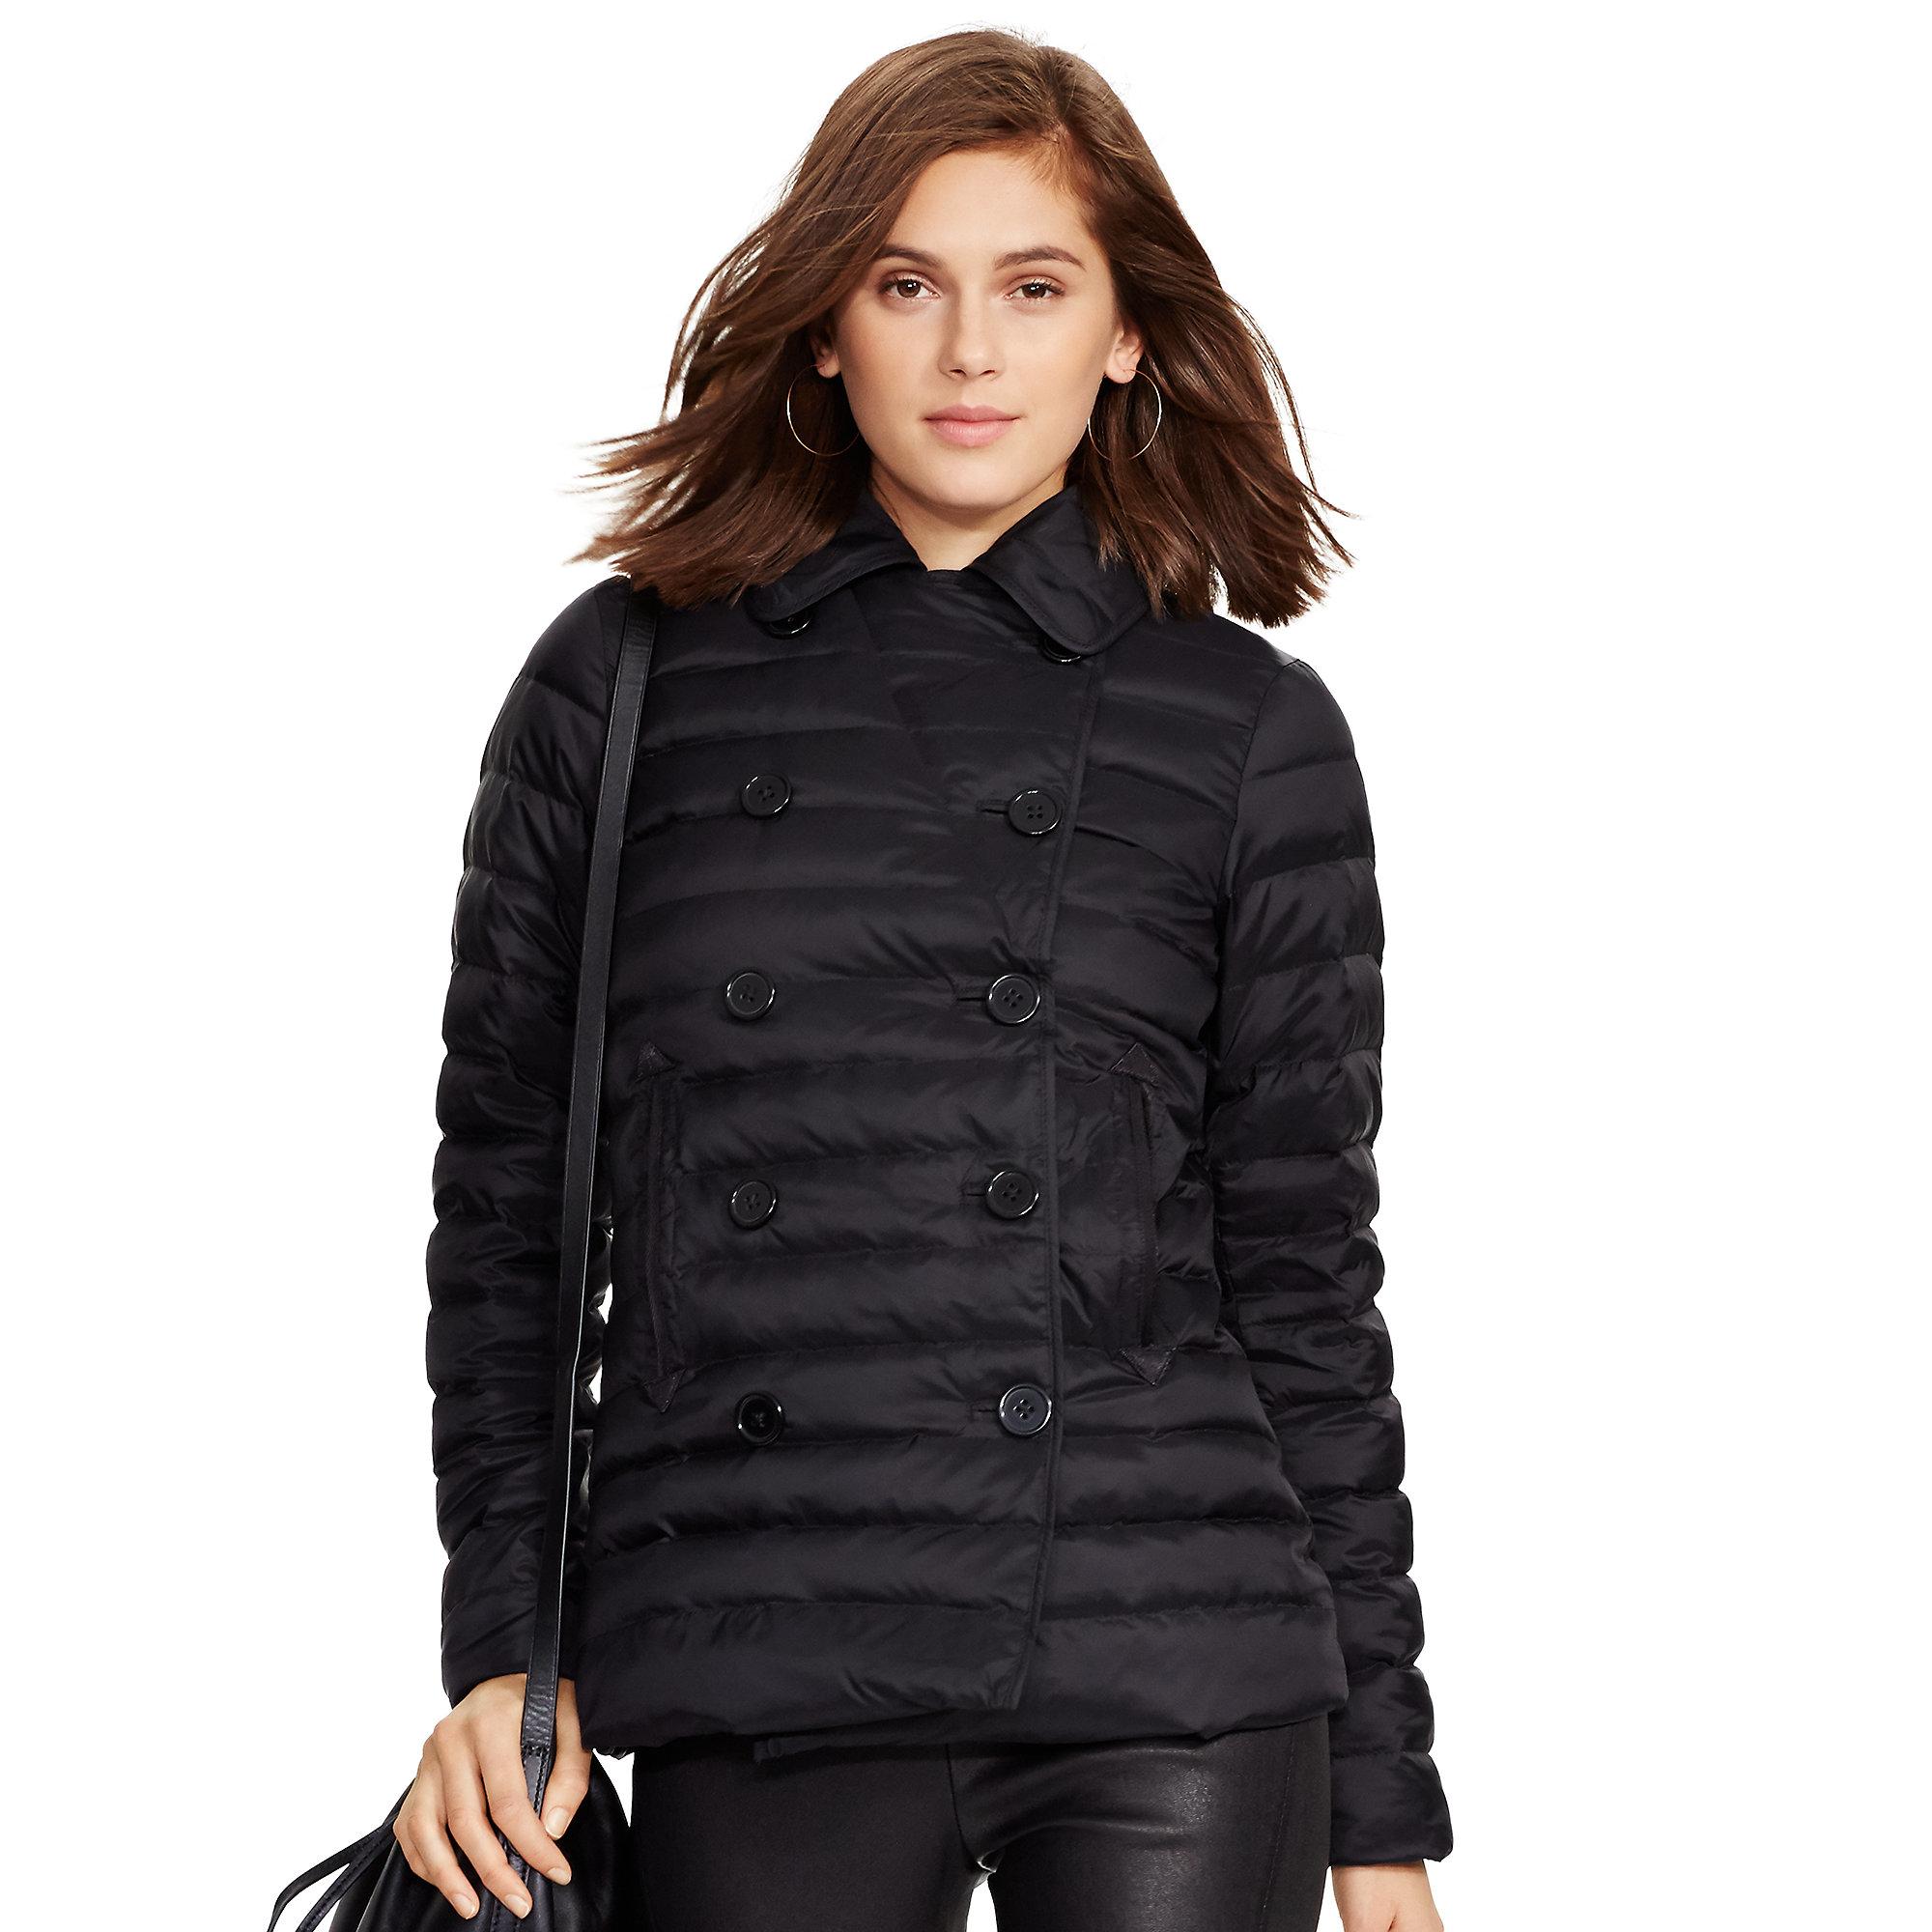 Lyst - Polo ralph lauren Quilted Down Pea Coat in Black : quilted pea coat - Adamdwight.com